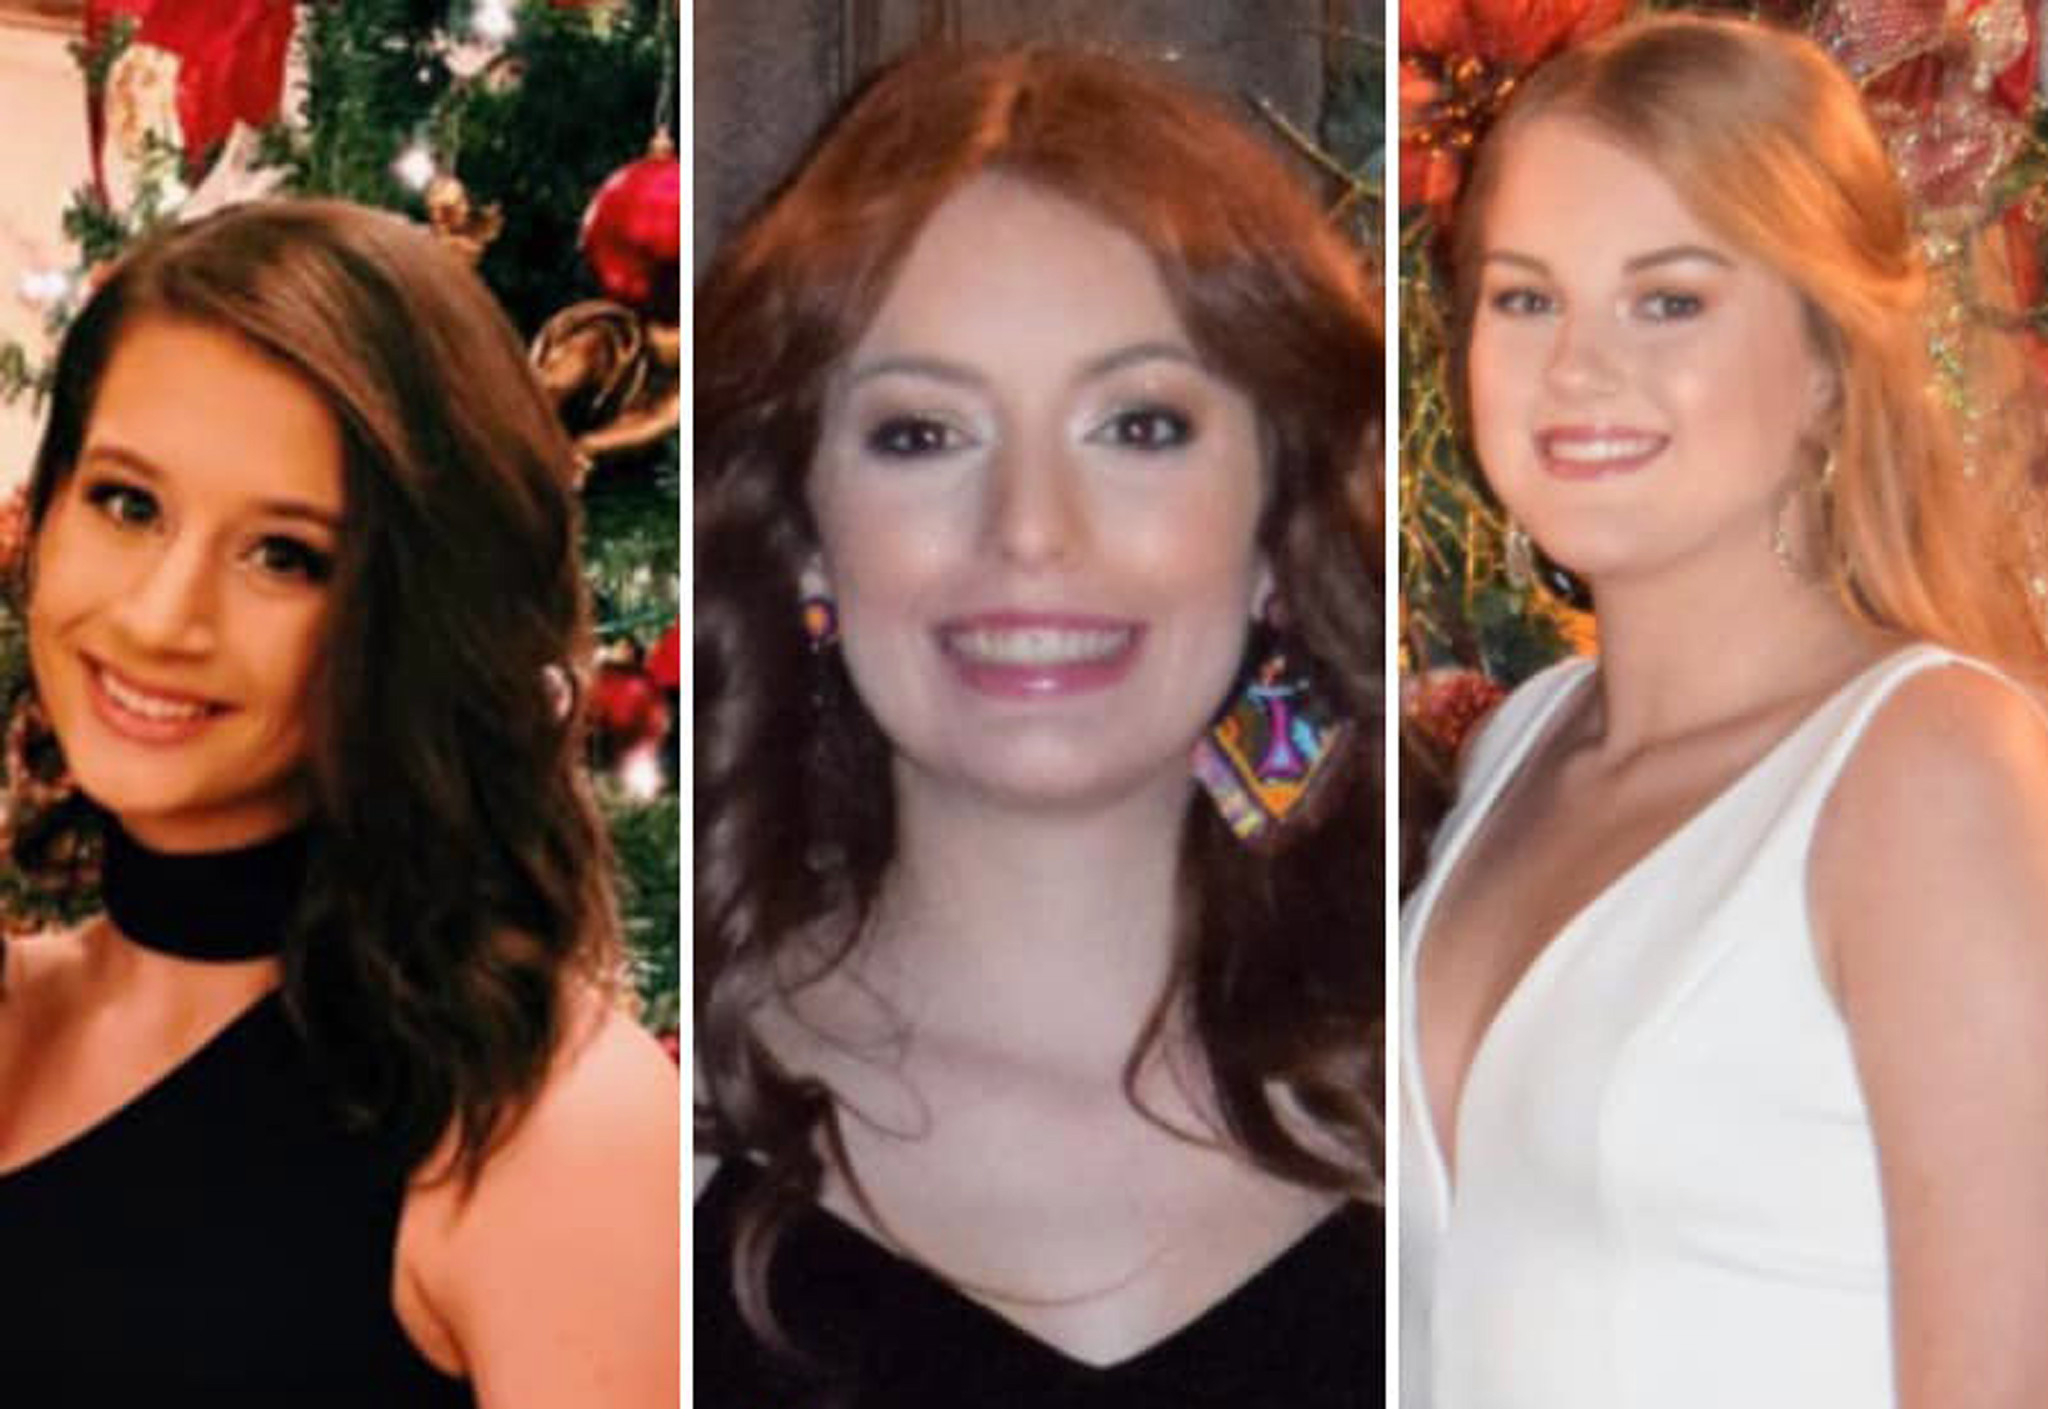 Three high school cheerleaders killed in one-car crash in Alabama on Christmas night